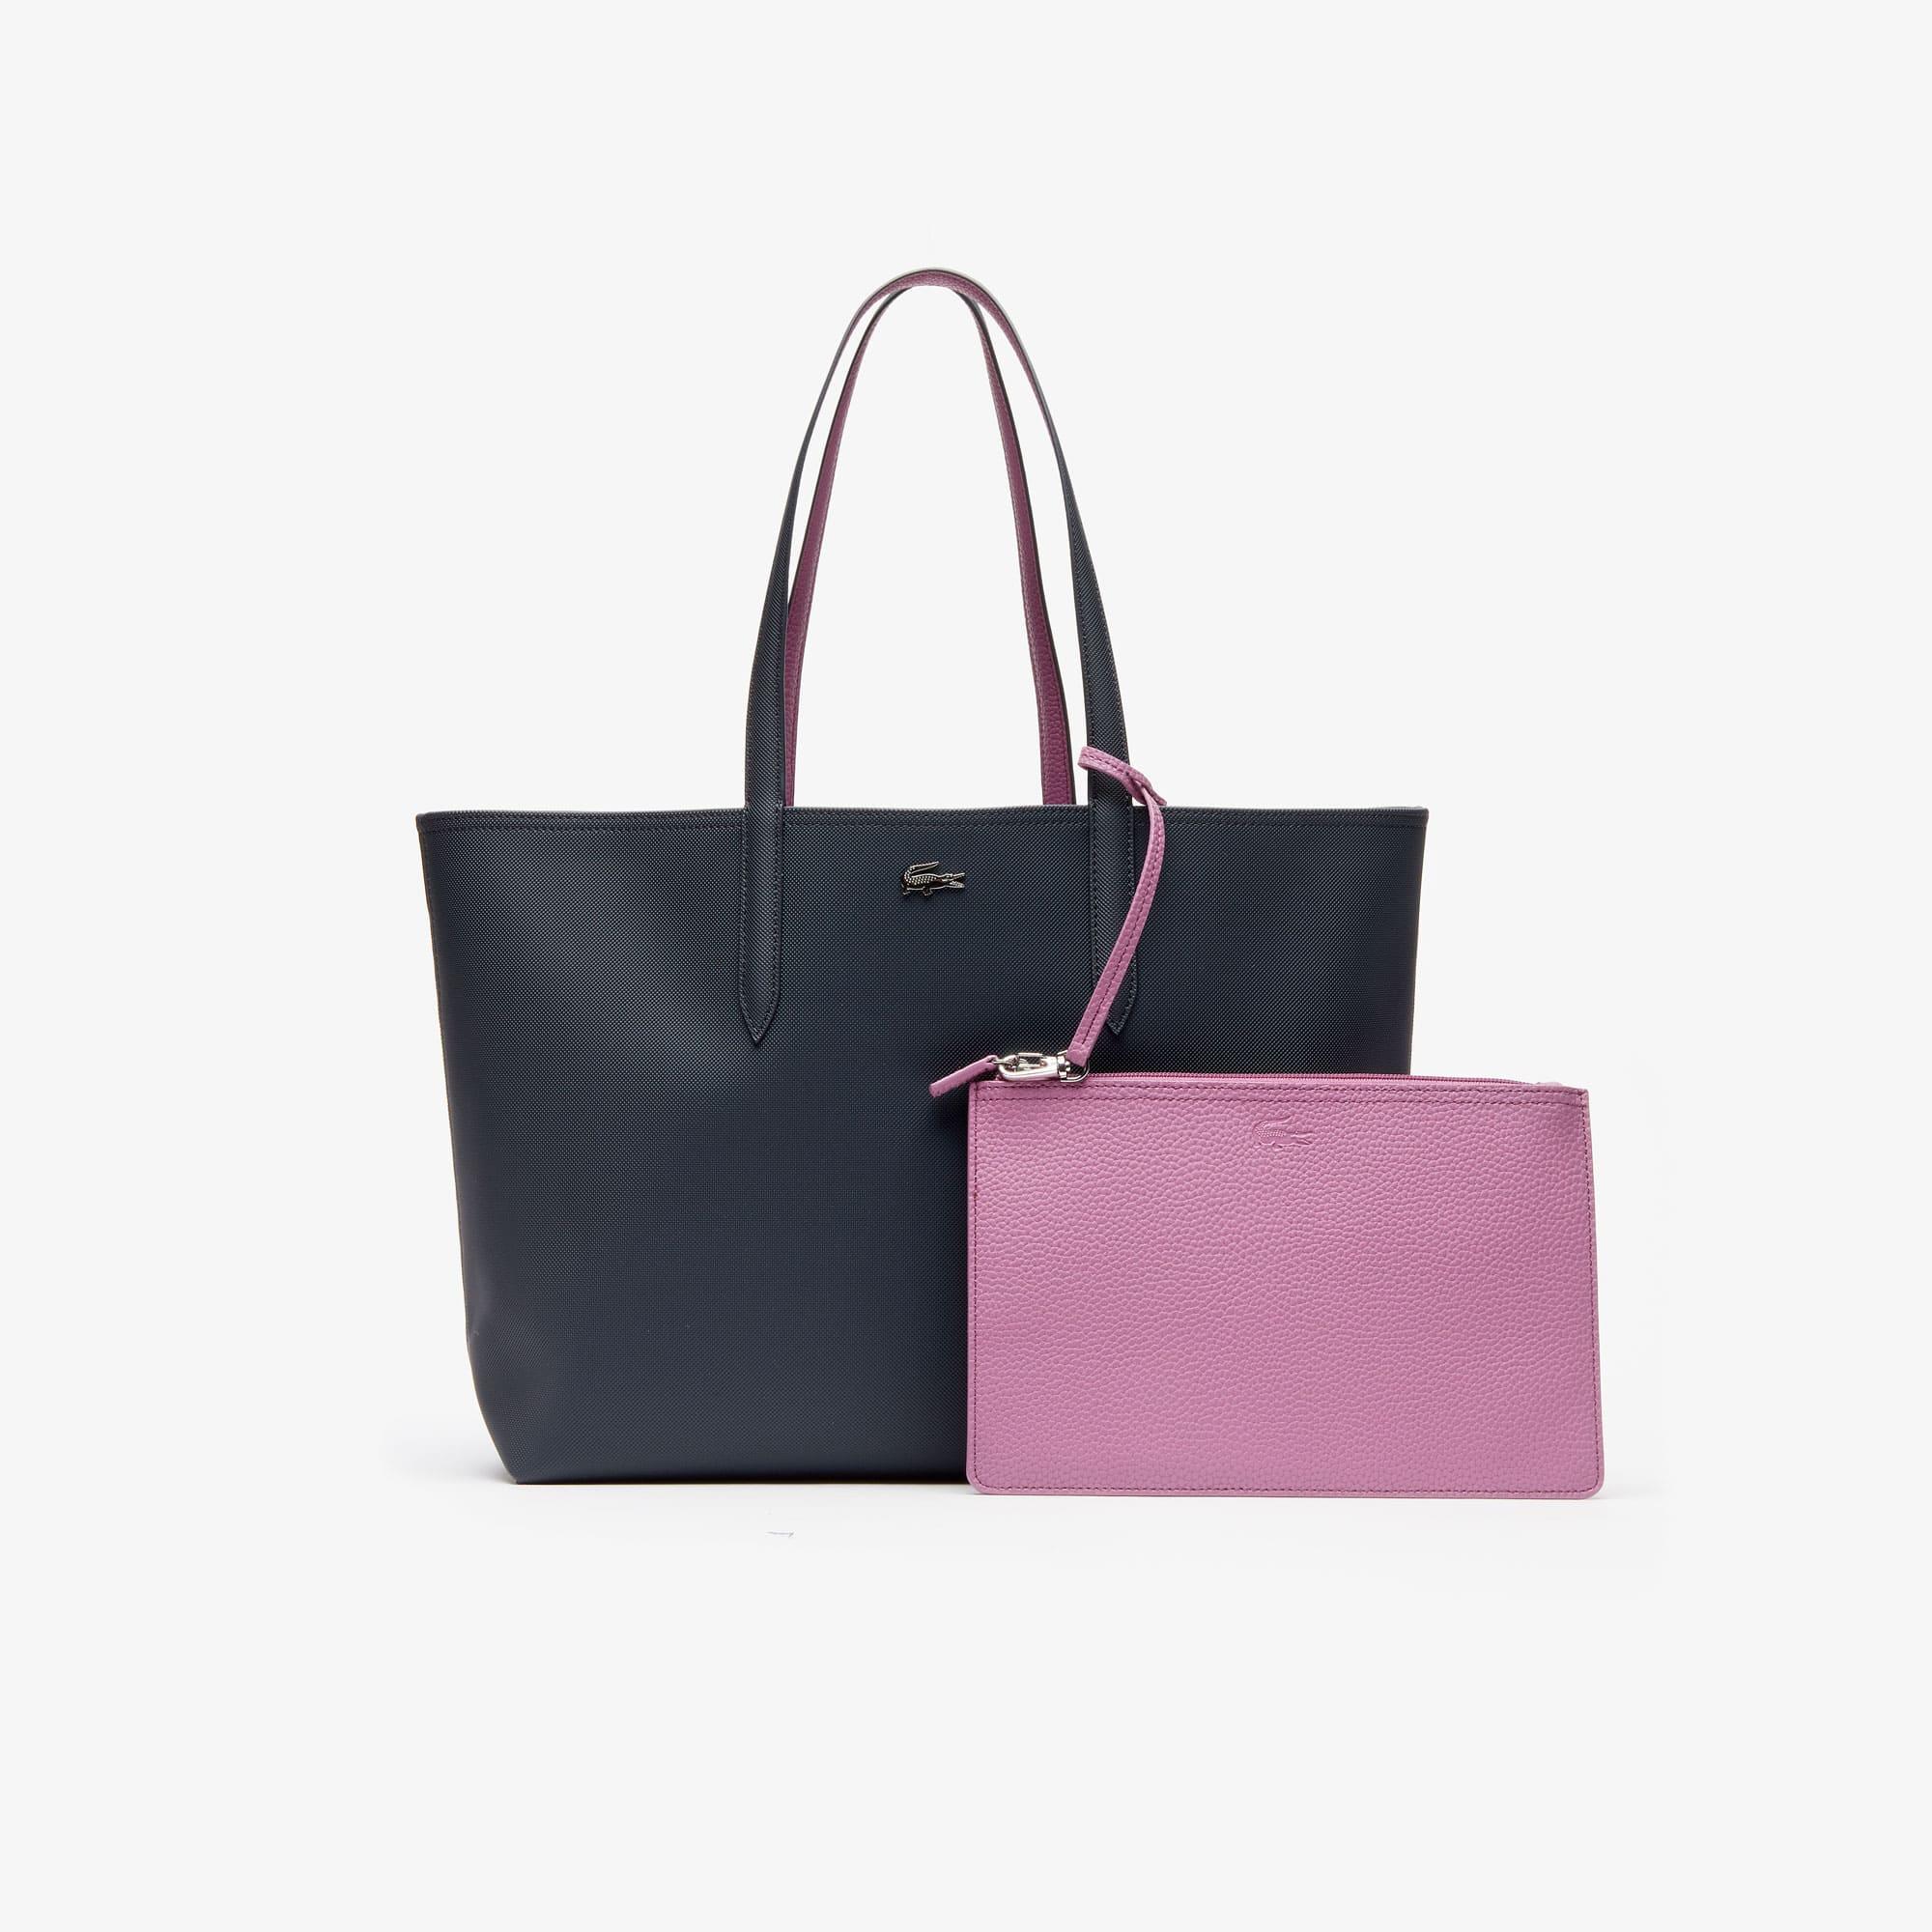 Bagsamp; Lacoste Leather Handbags CollectionWomen's Goods qUpGLzSMV